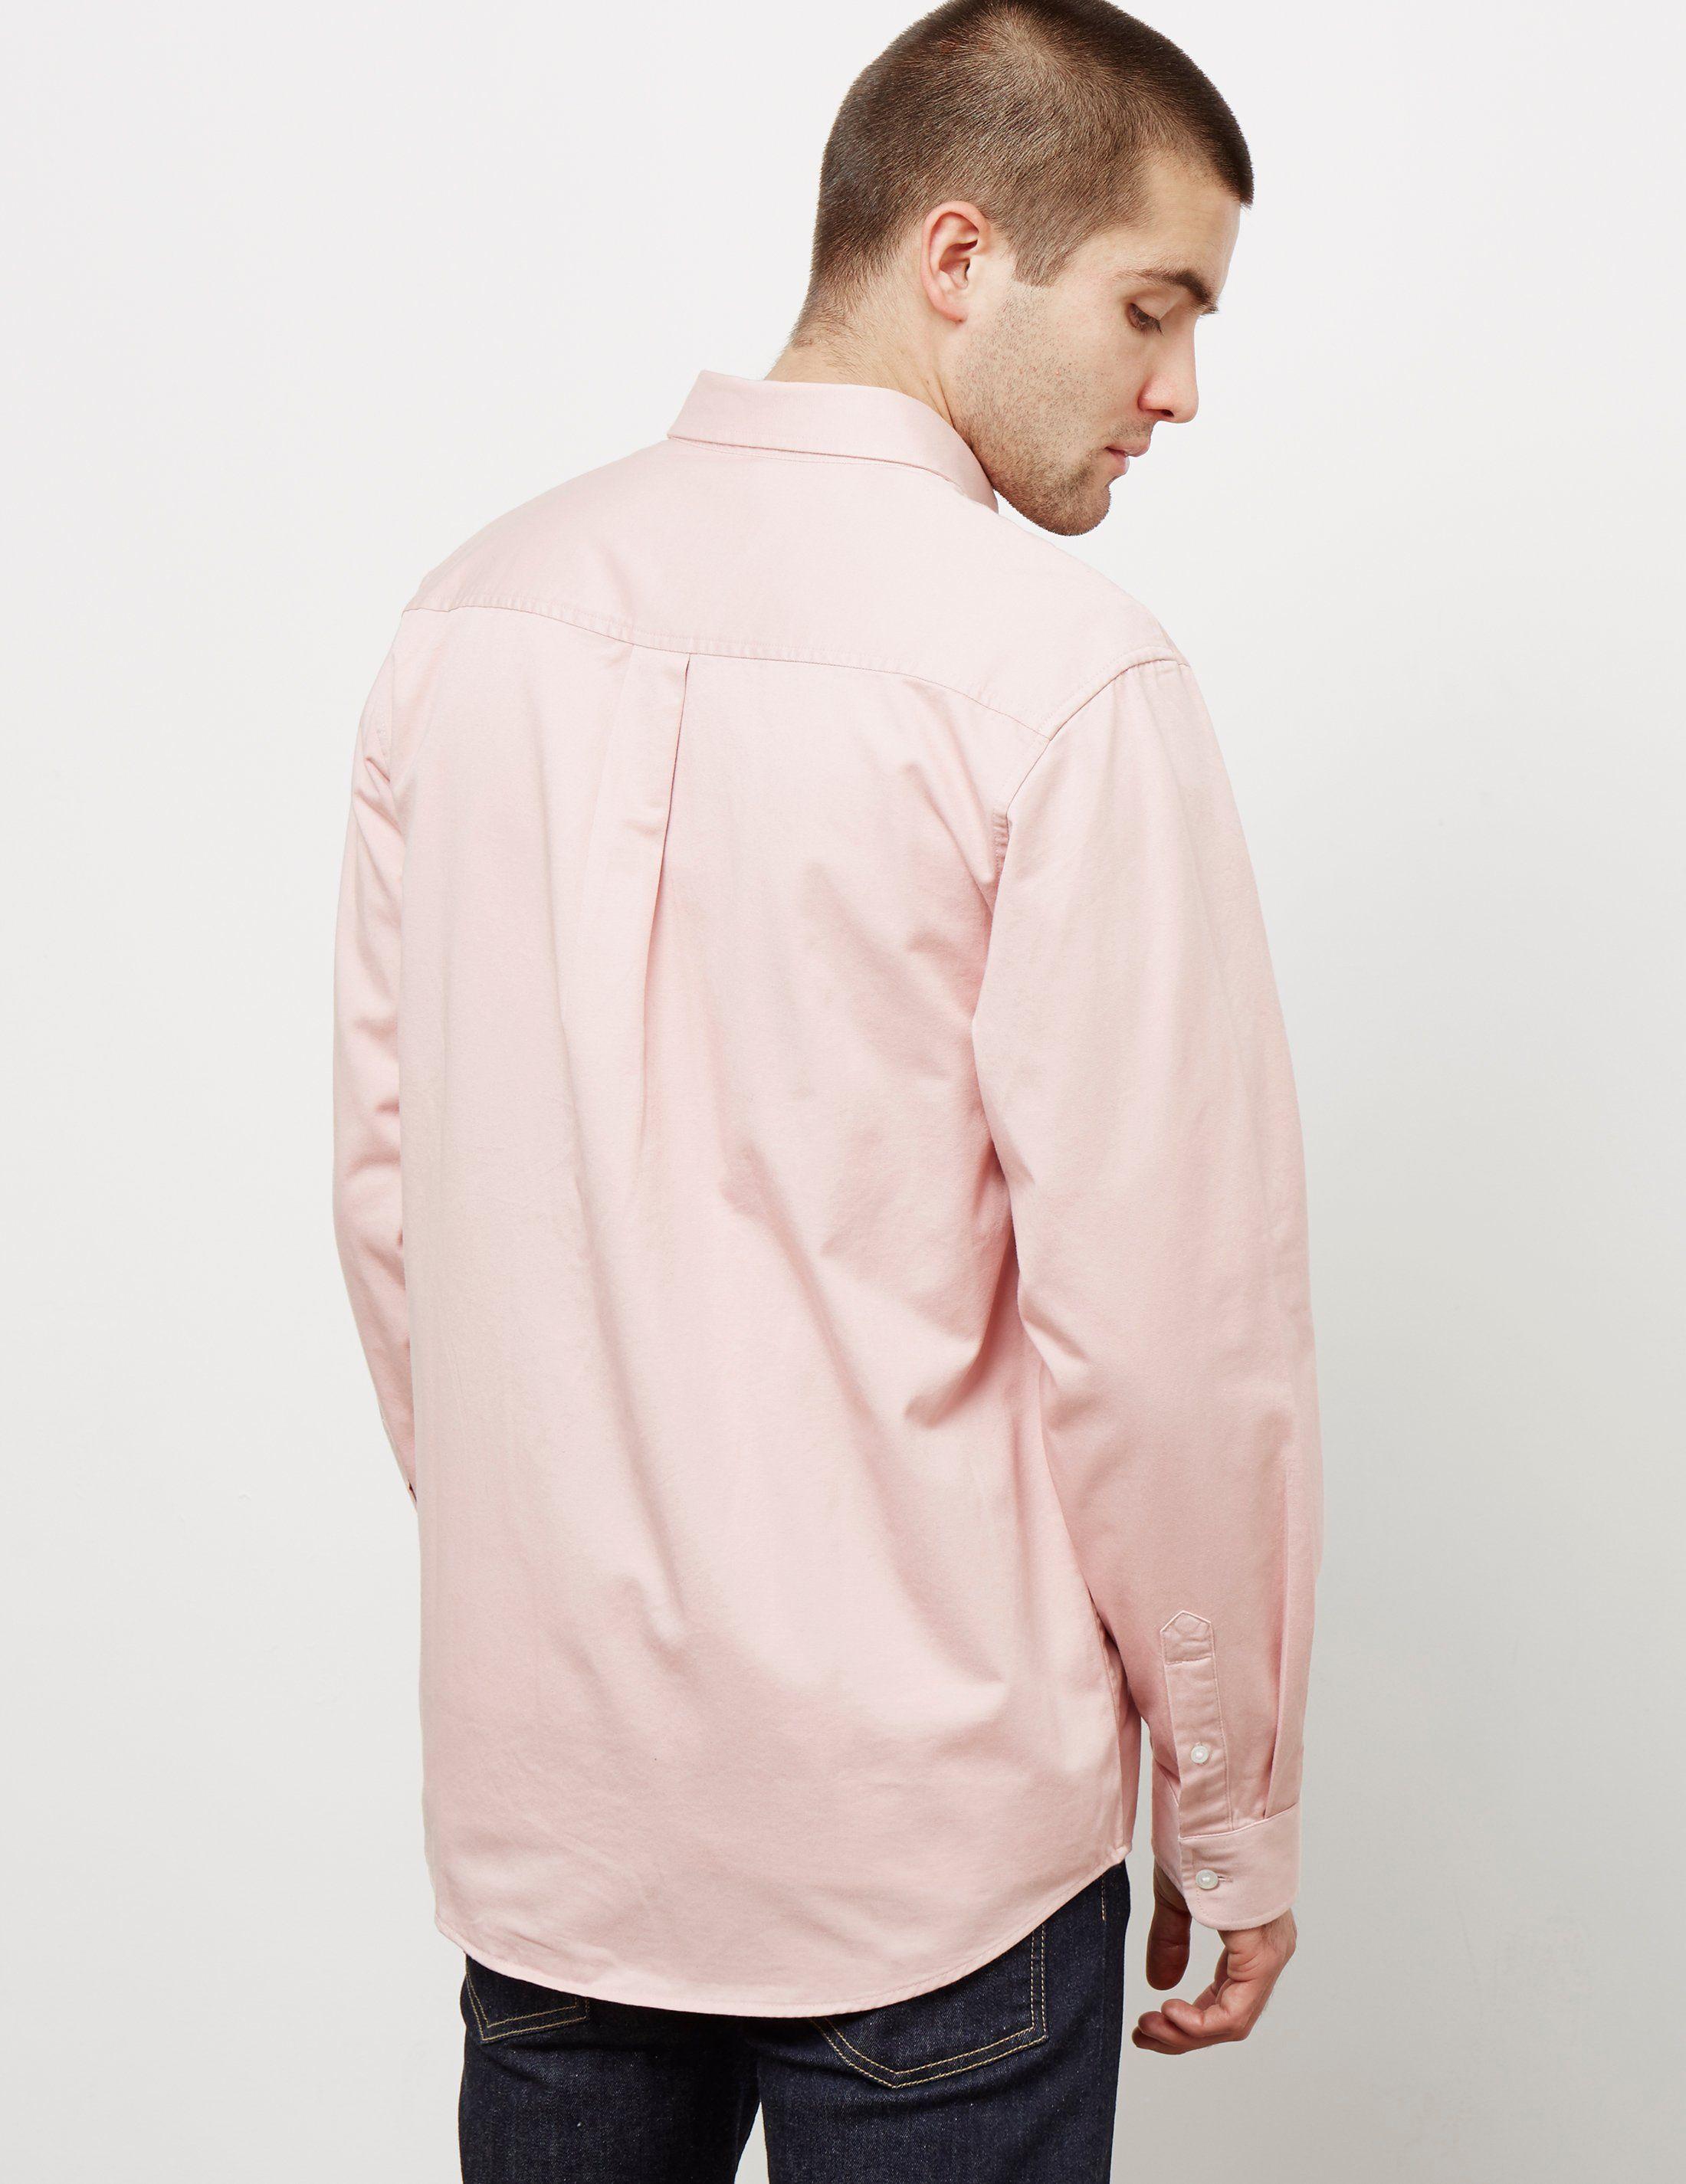 Carhartt WIP Madison Long Sleeve Shirt - Online Exclusive